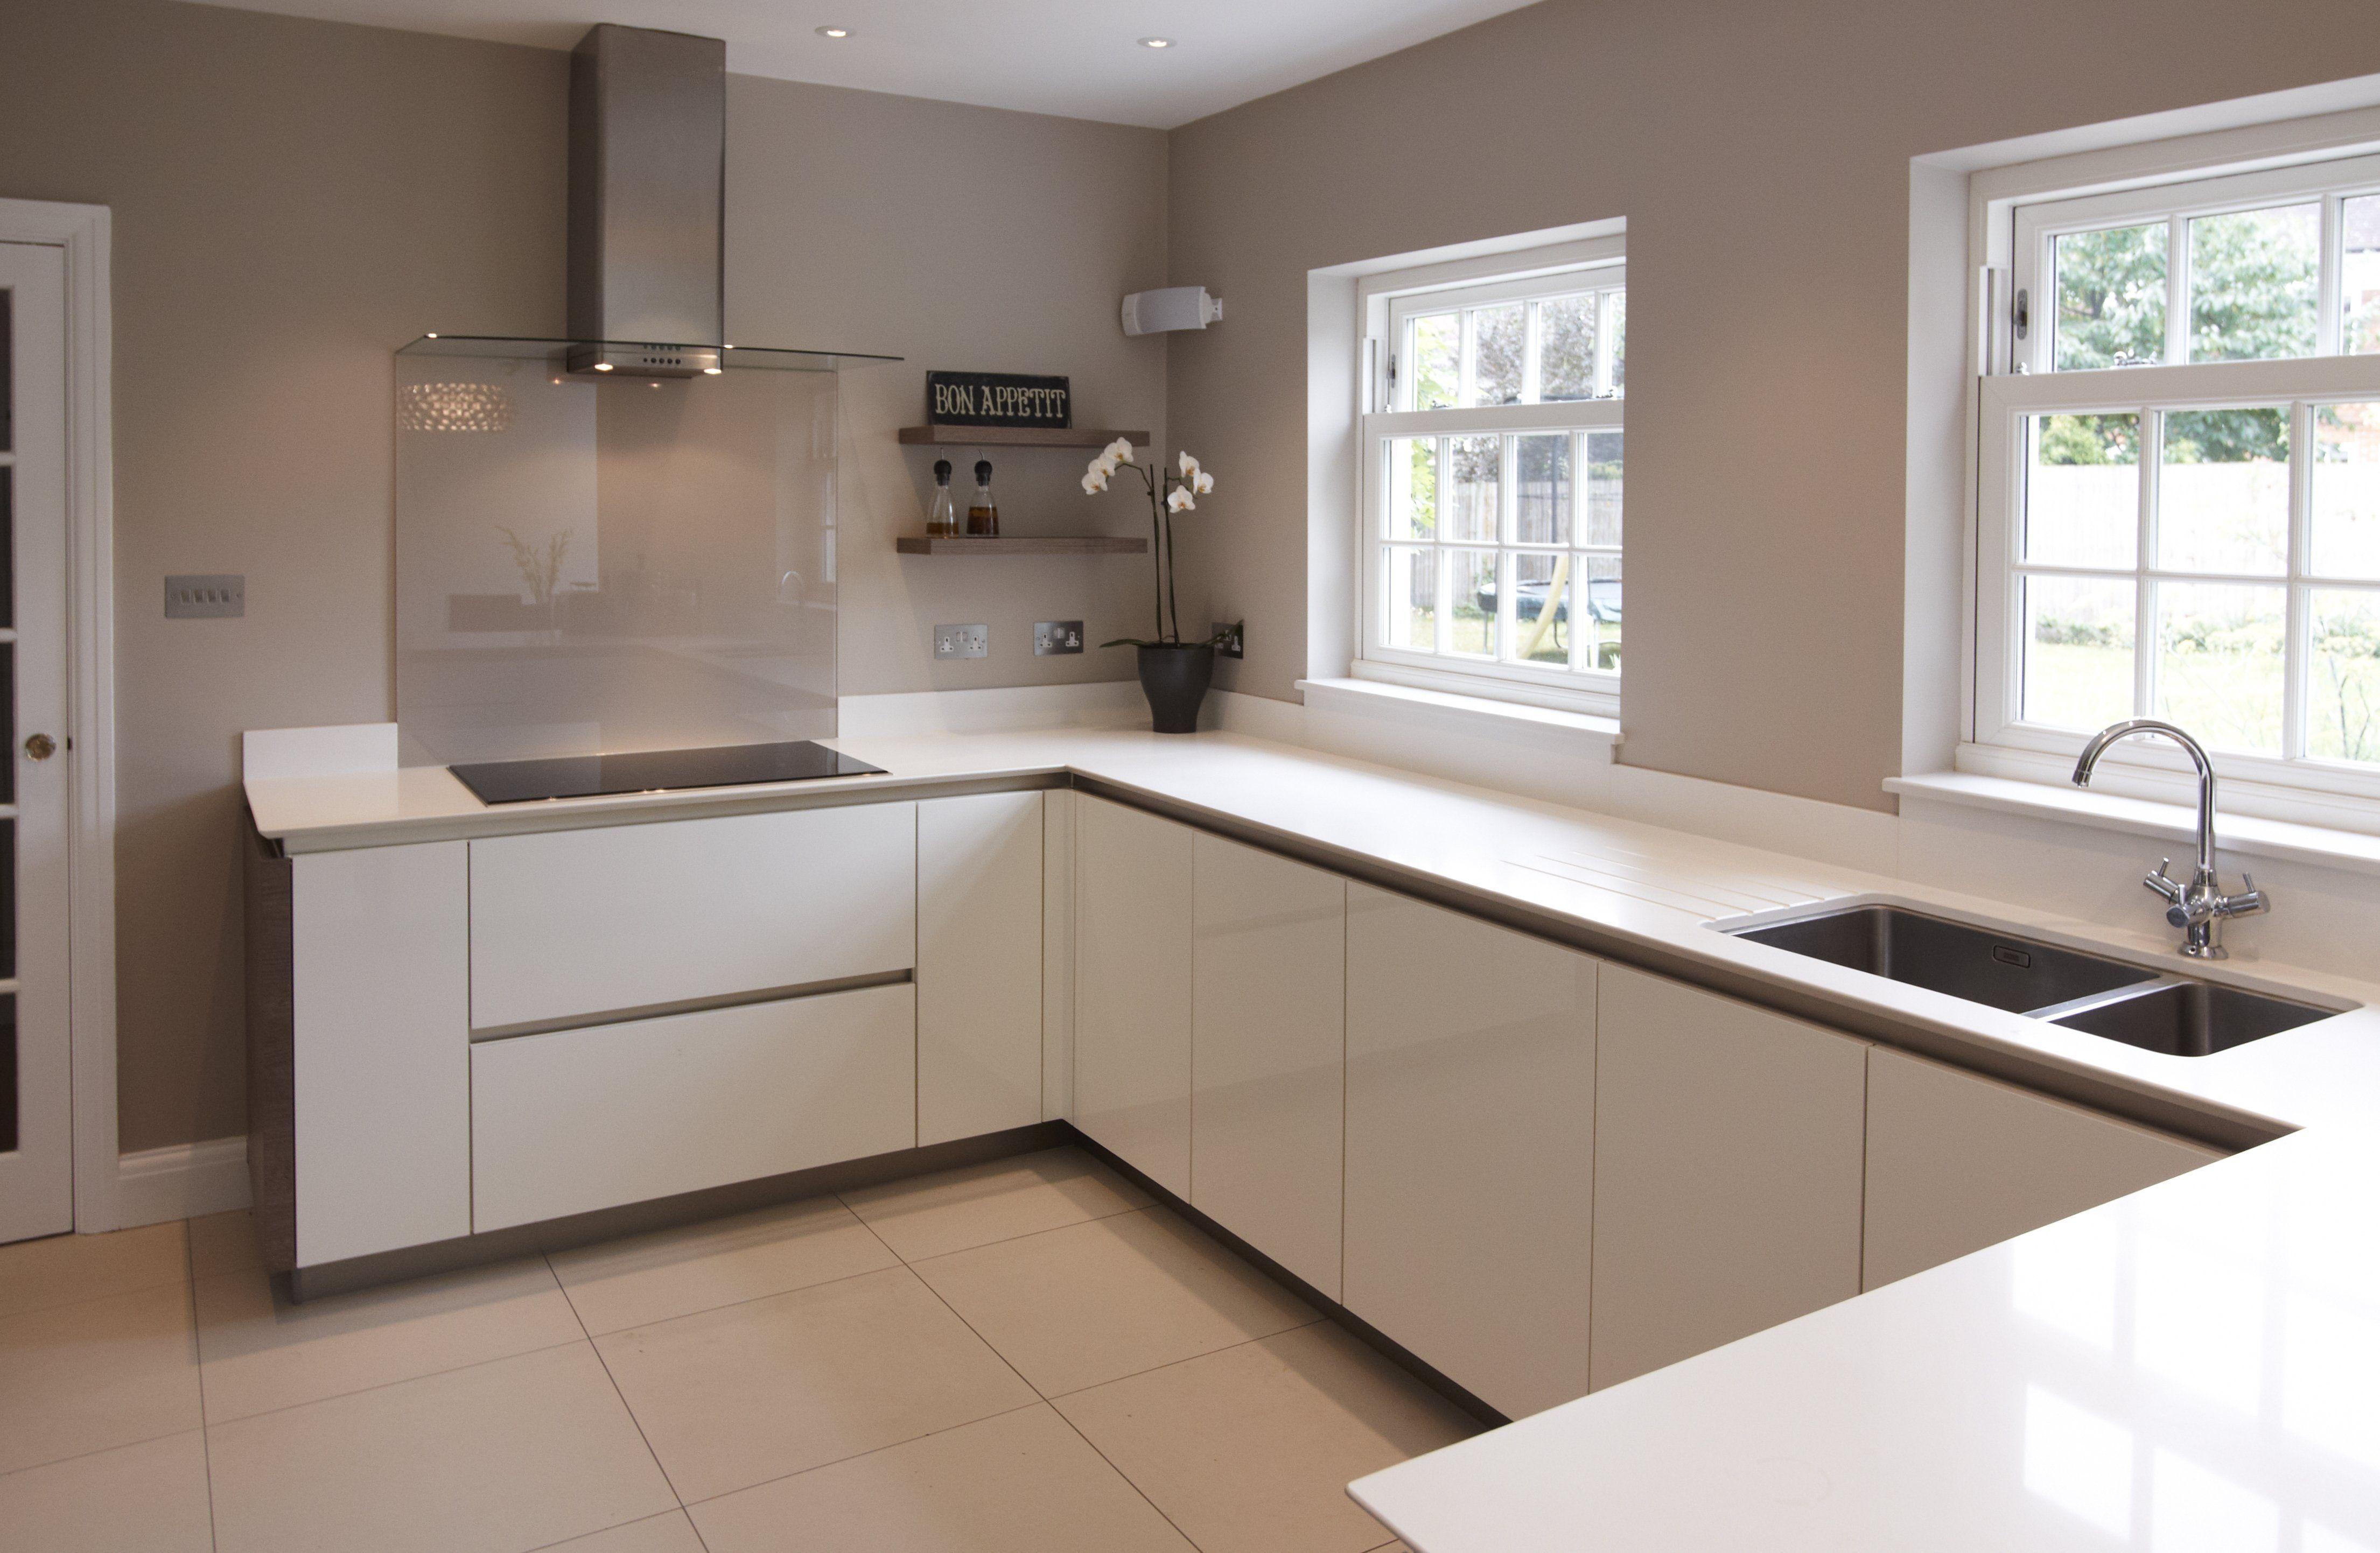 35+ Glossy white kitchen cabinets inspirations